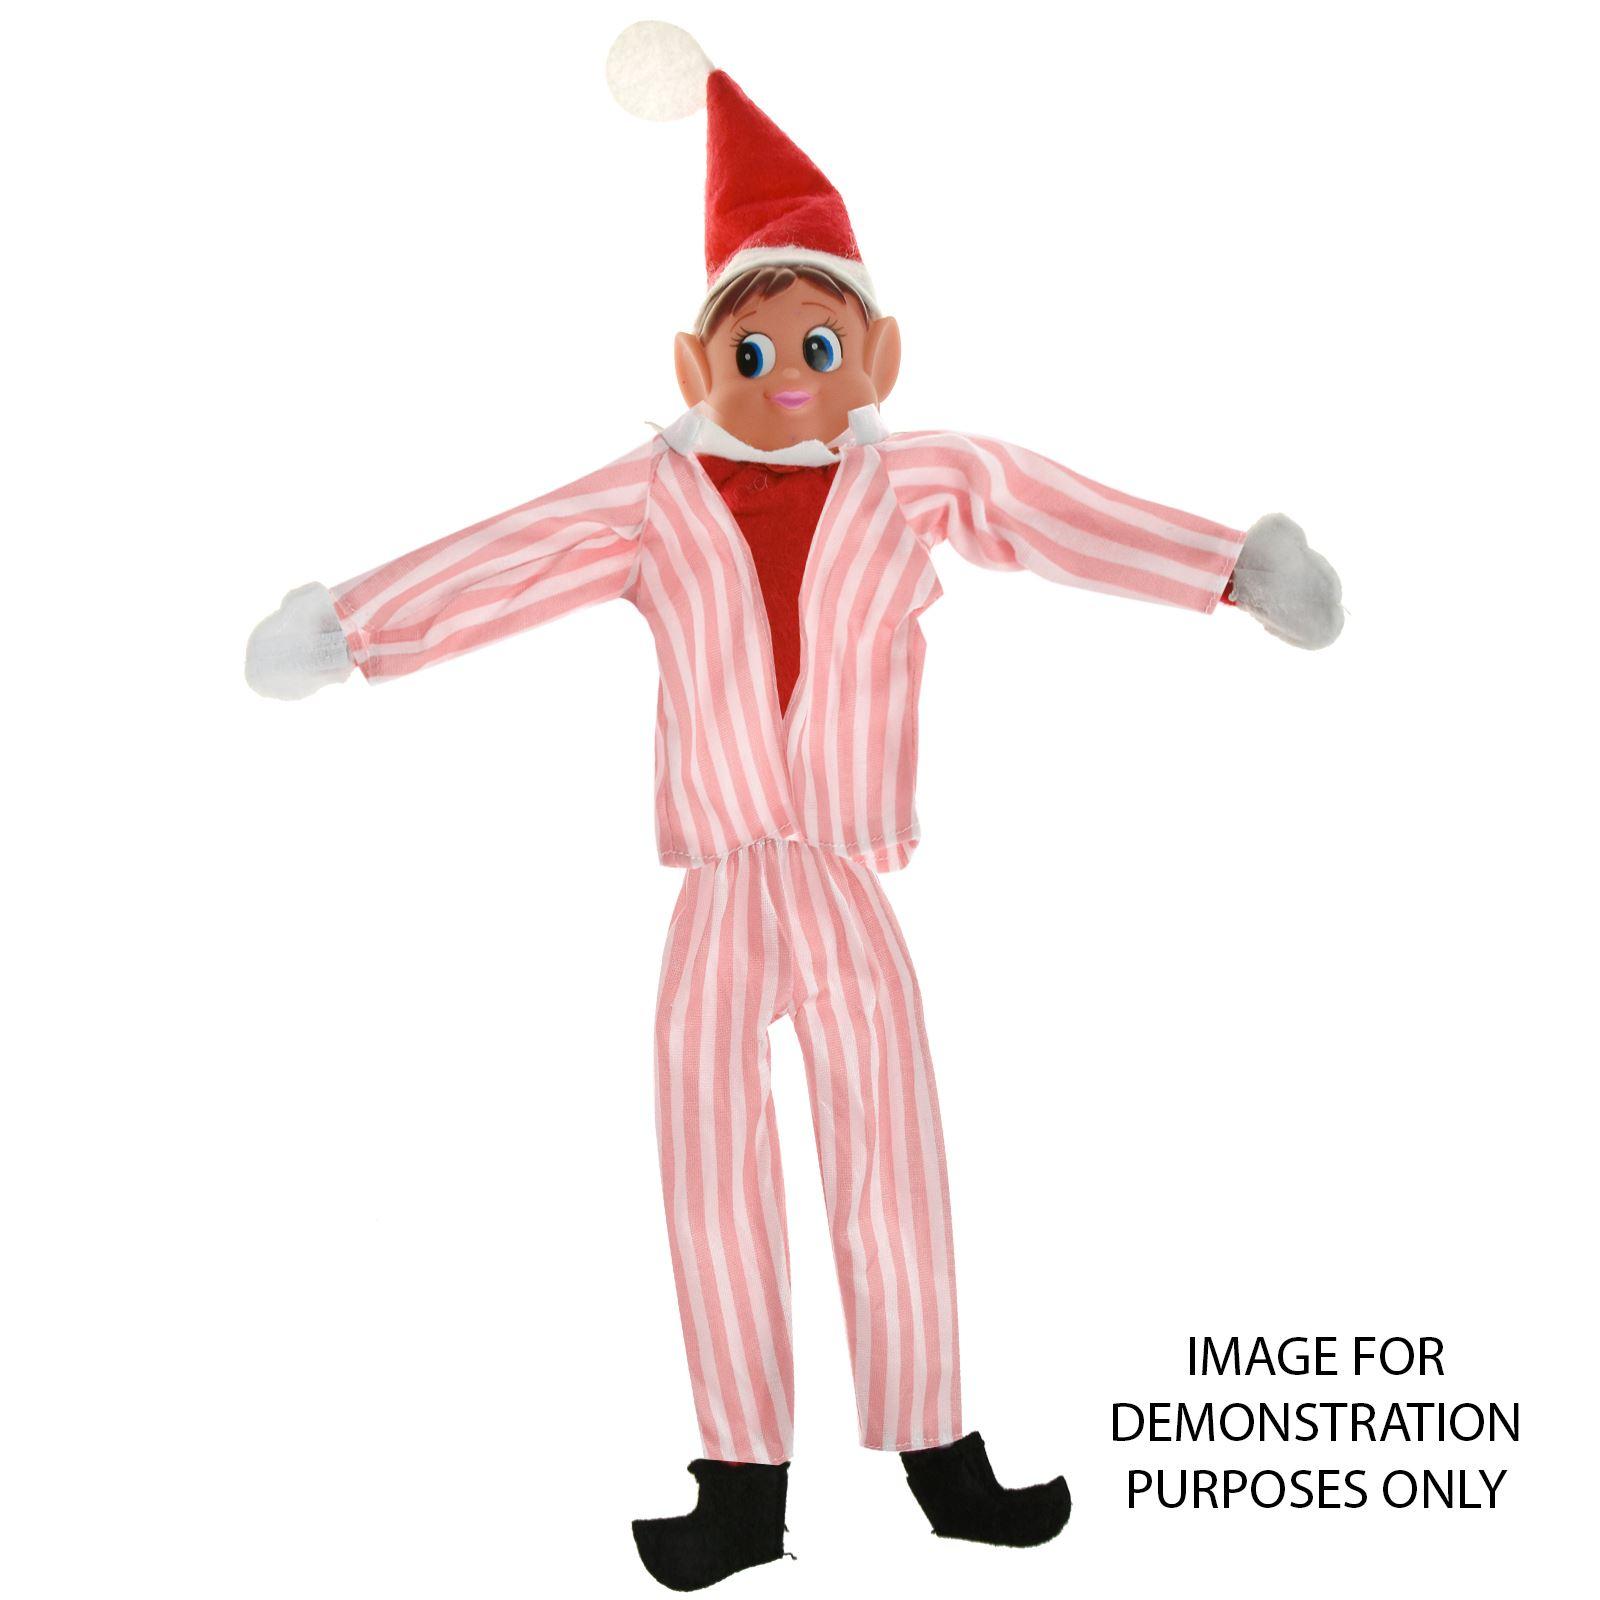 Naughty-ELF-Pigiama-Elfi-latitanti-034-Male-Blu-Rosa-Natale-Novita-Natale-Prop miniatura 7